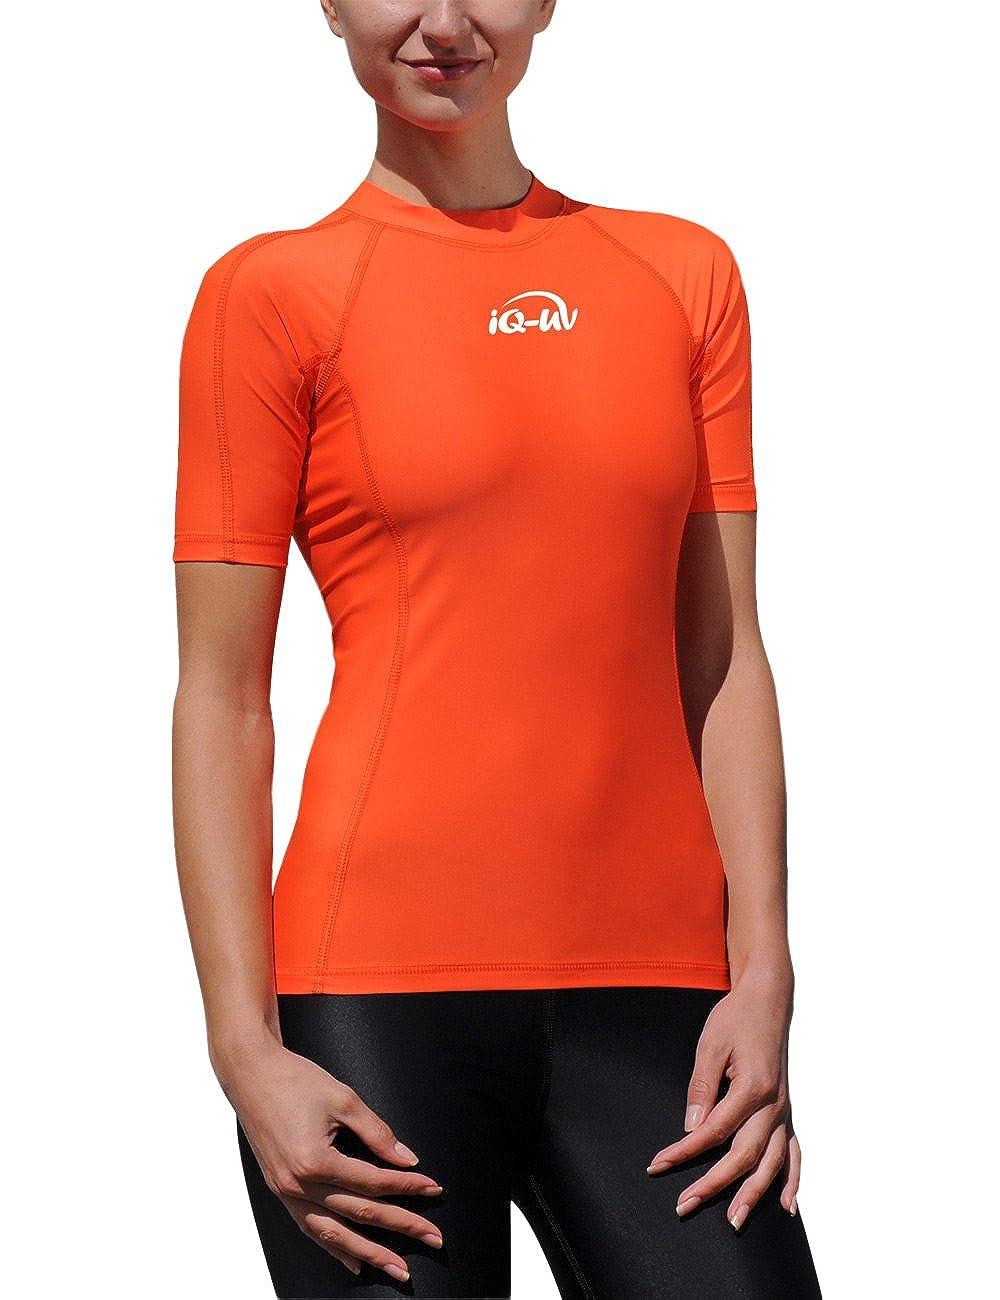 iQ-Company Iq 300 Eng Geschnitten, UV-Schutz T-Shirt Camiseta con Manga Corta, Mujer